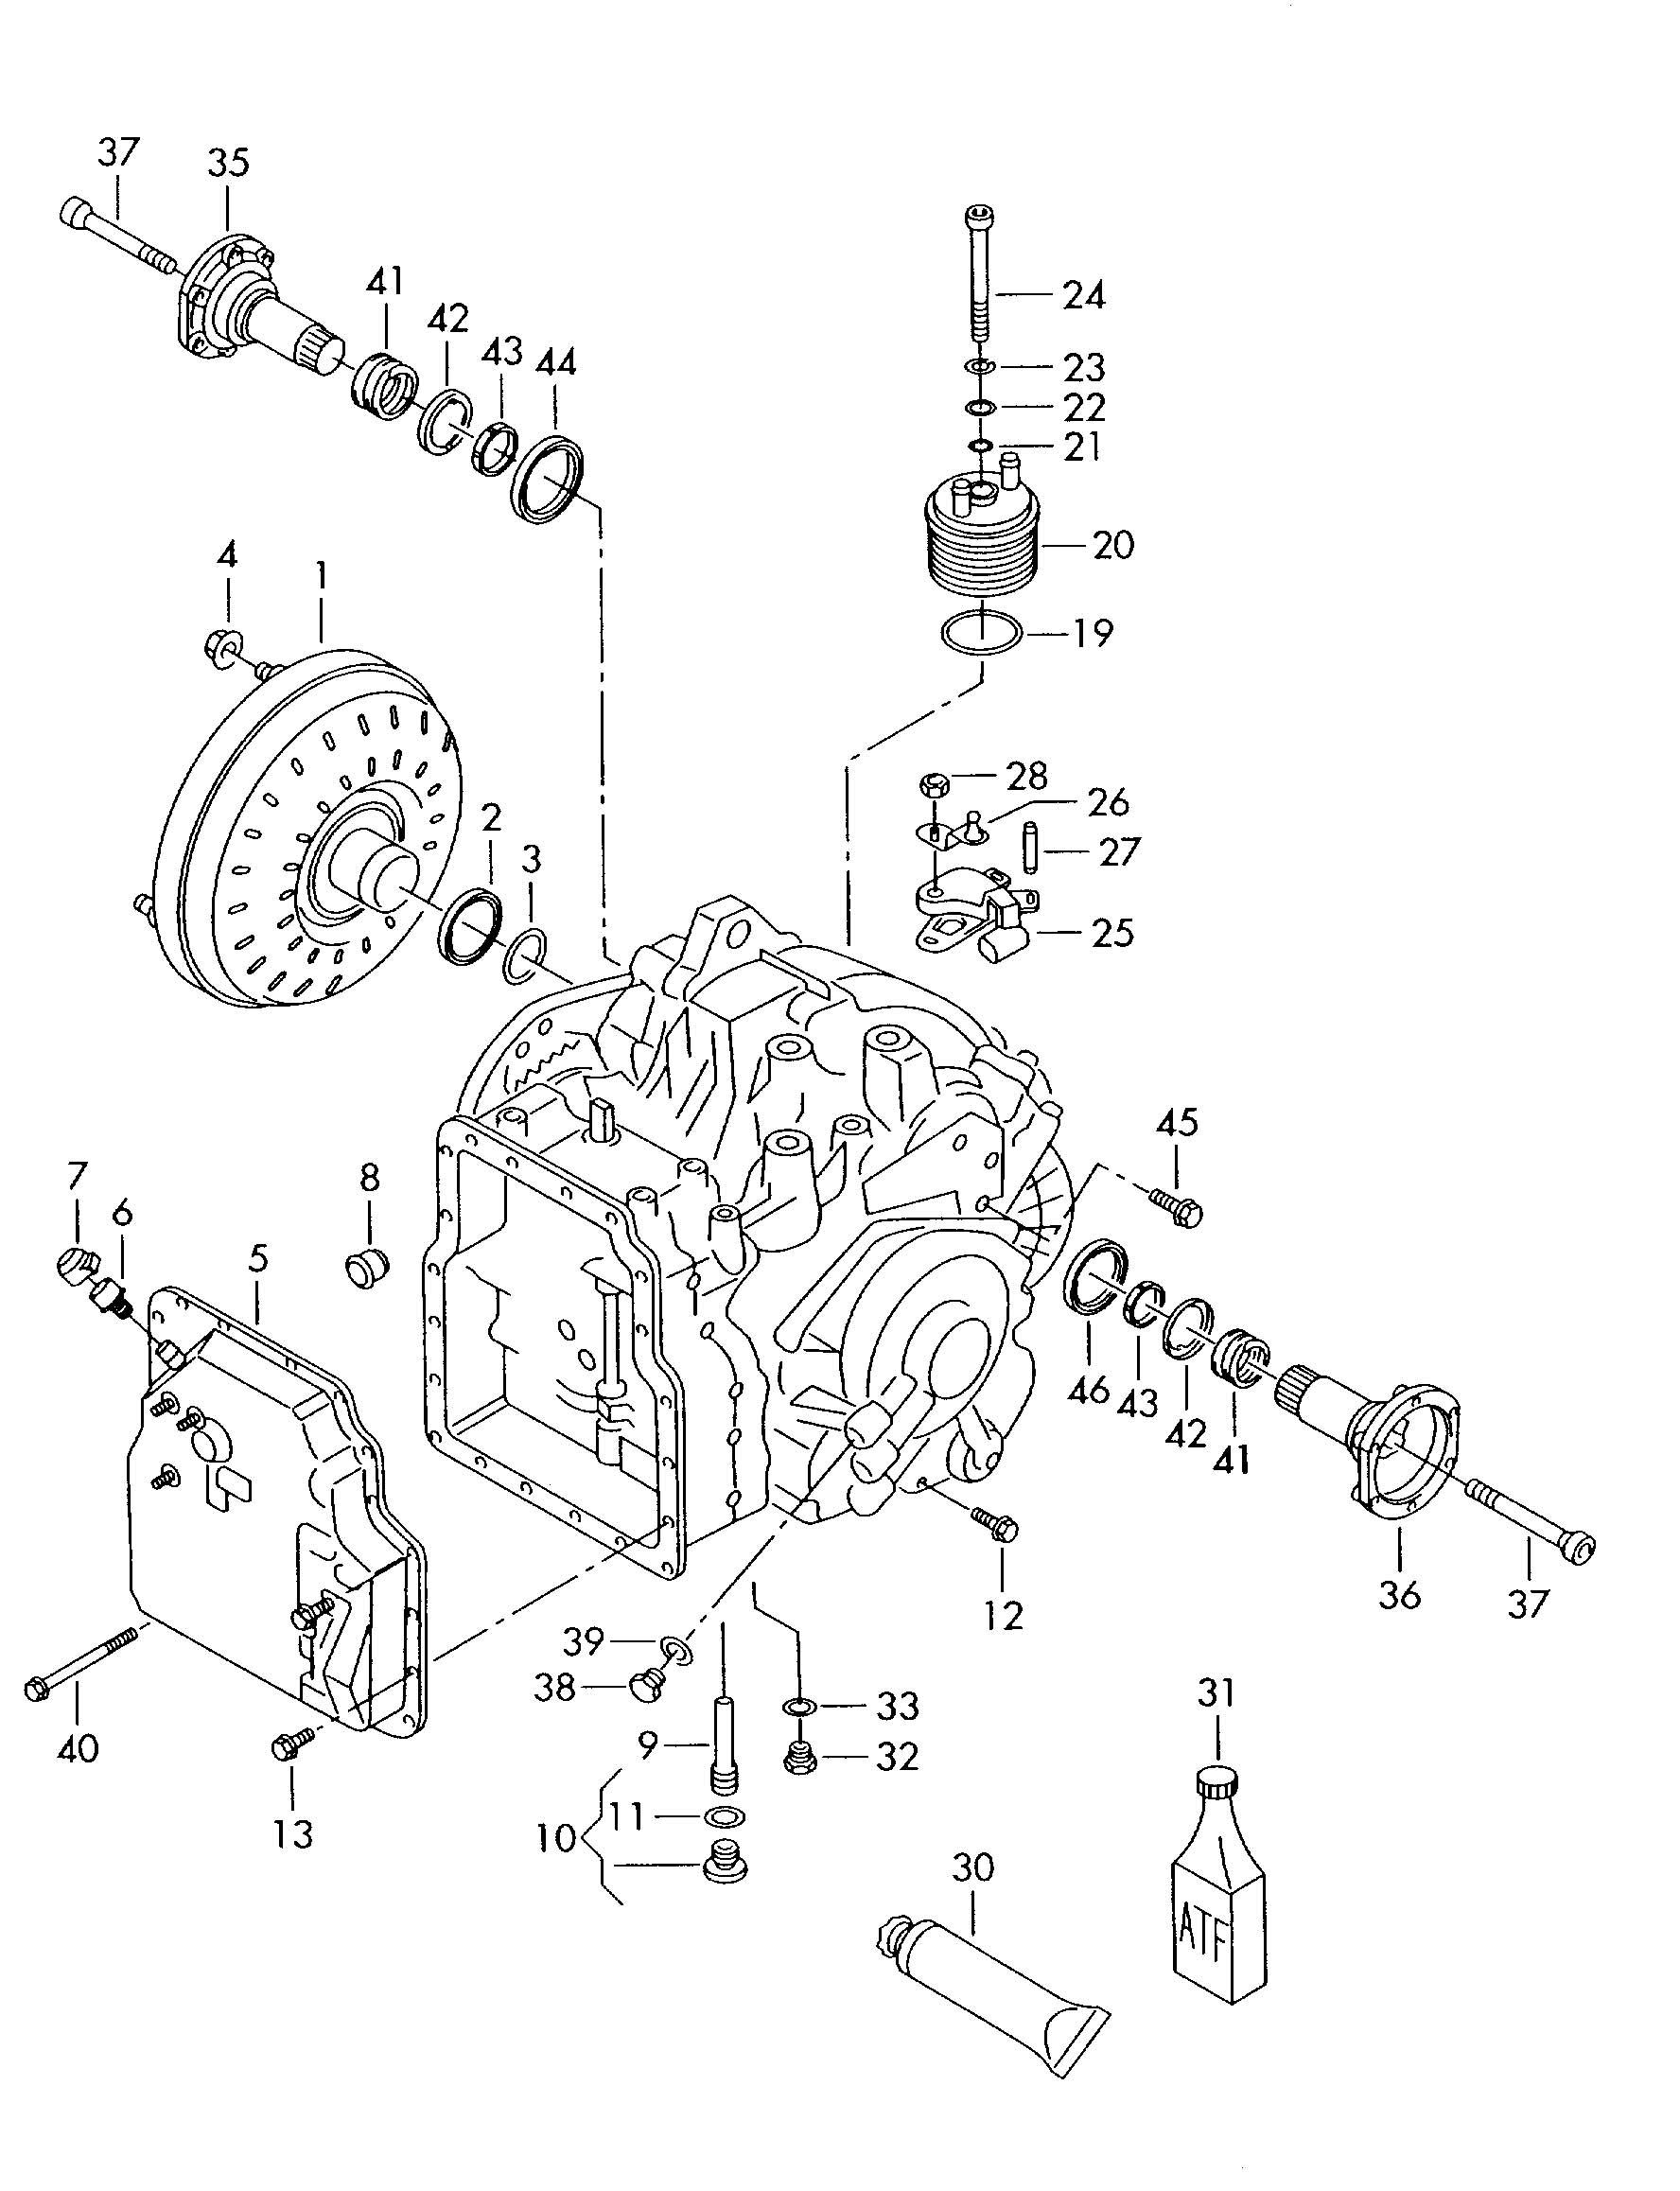 volkswagen tiguan wiring diagram pw50 vw automatic transmission imageresizertool com